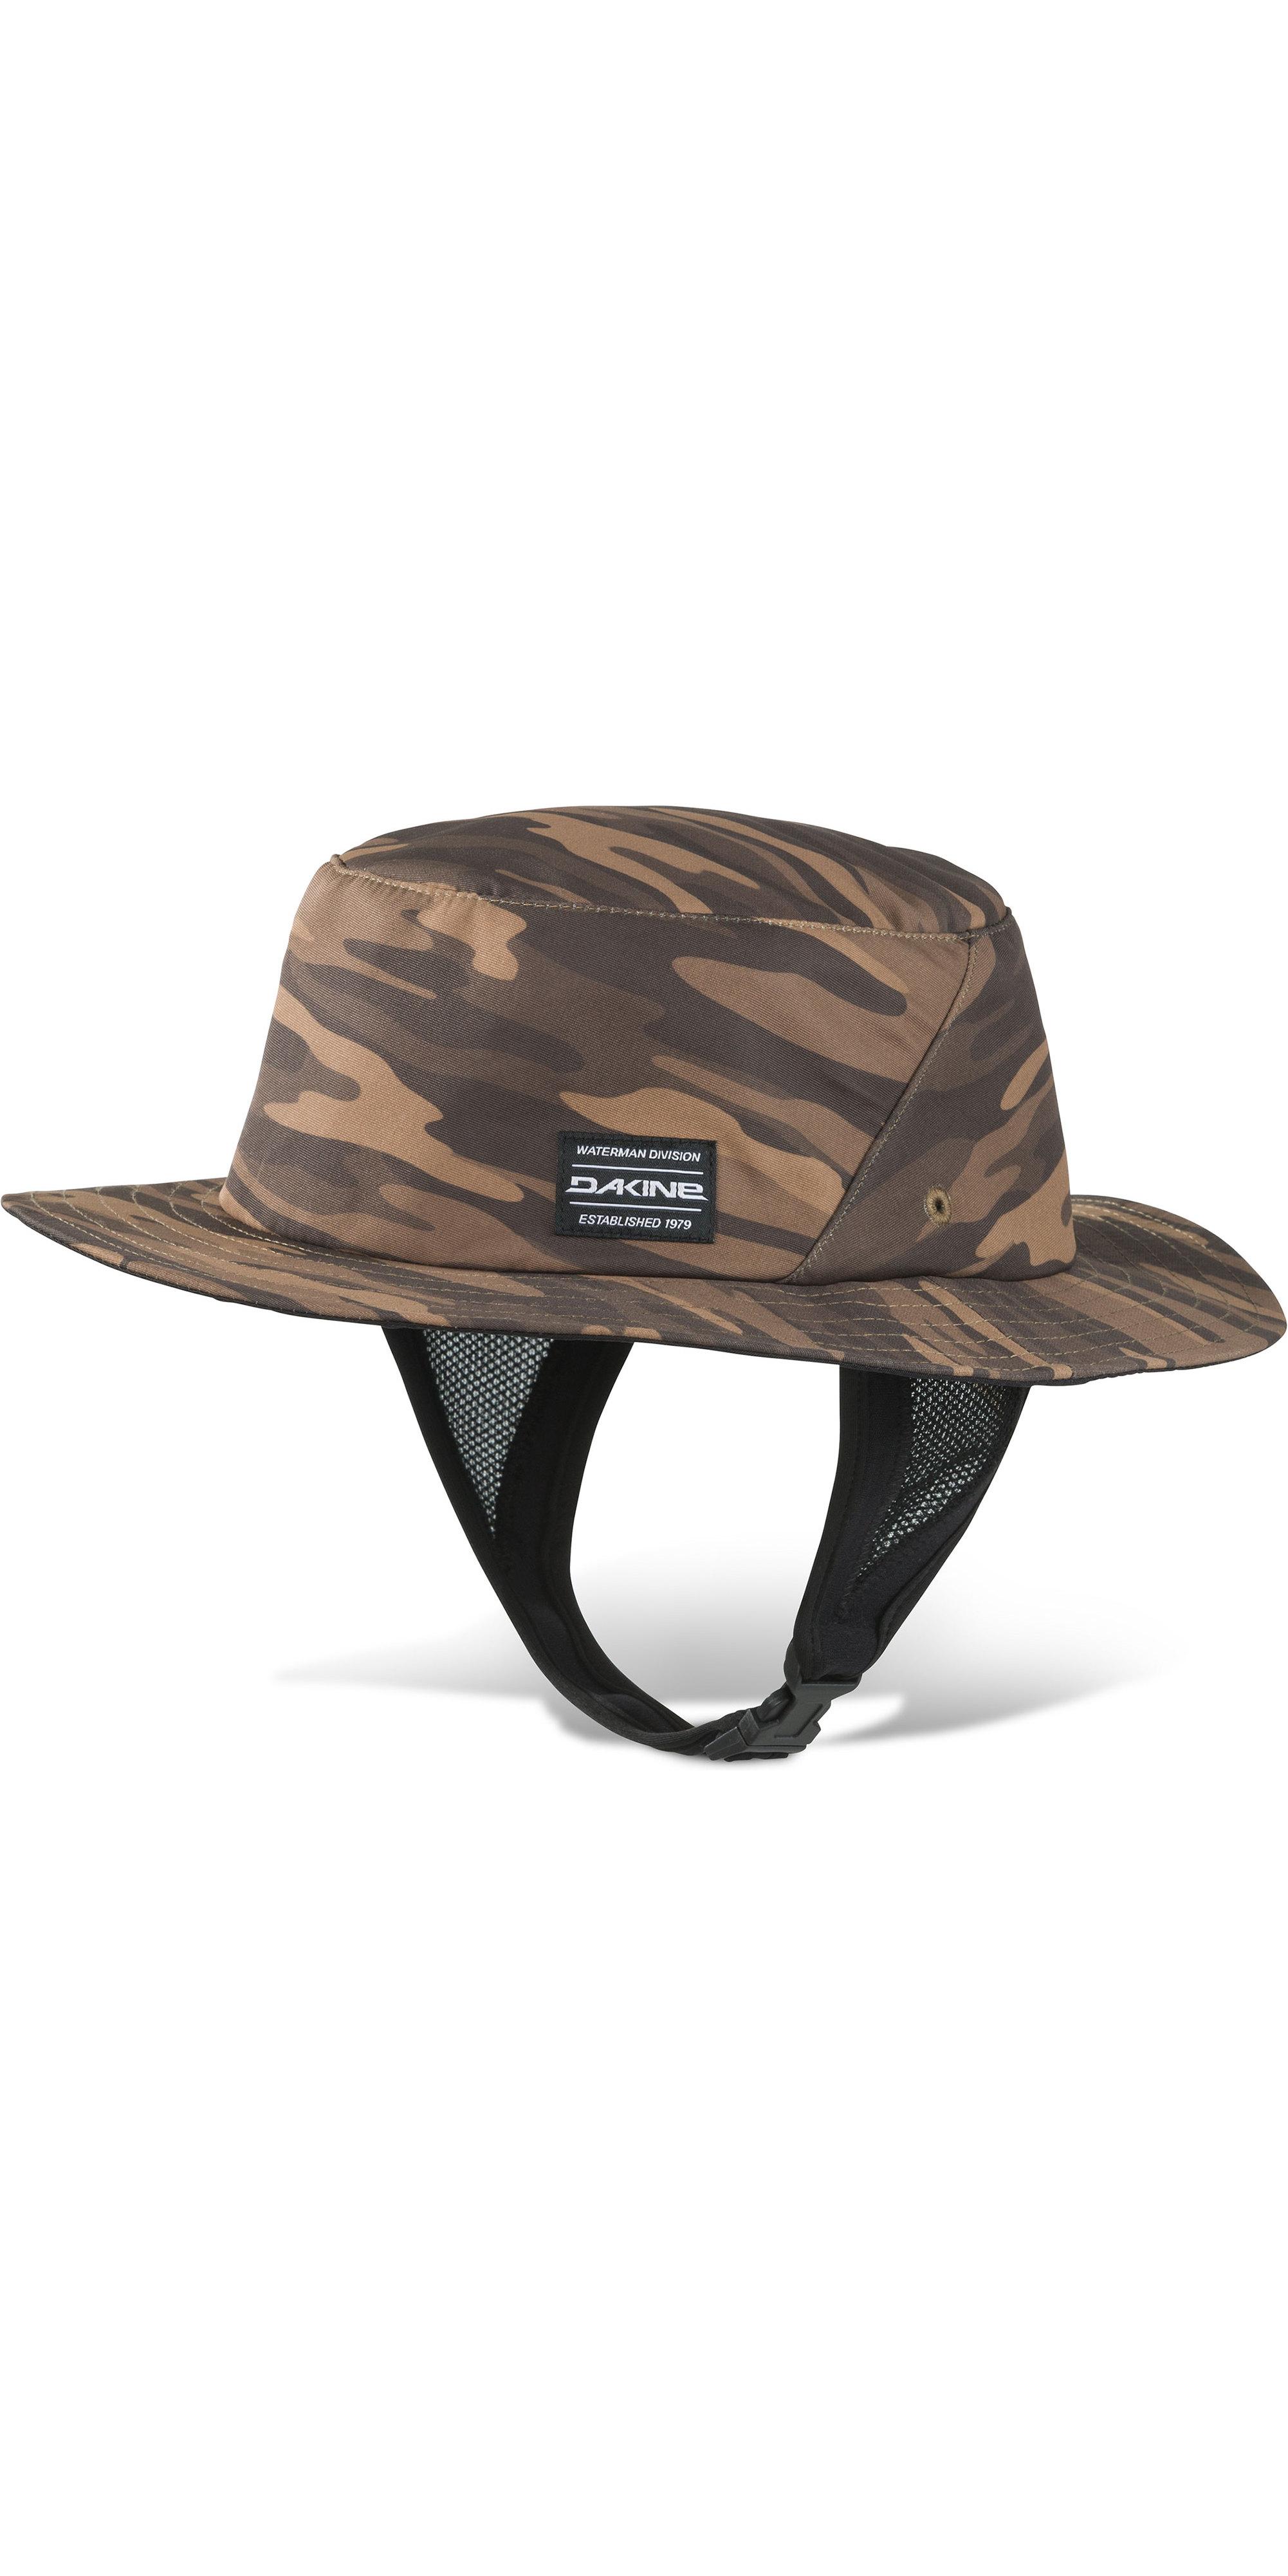 67f0ababcc114 2019 Dakine Indo Surf Hat Field Camo 10002456 - Technical Hats Caps ...